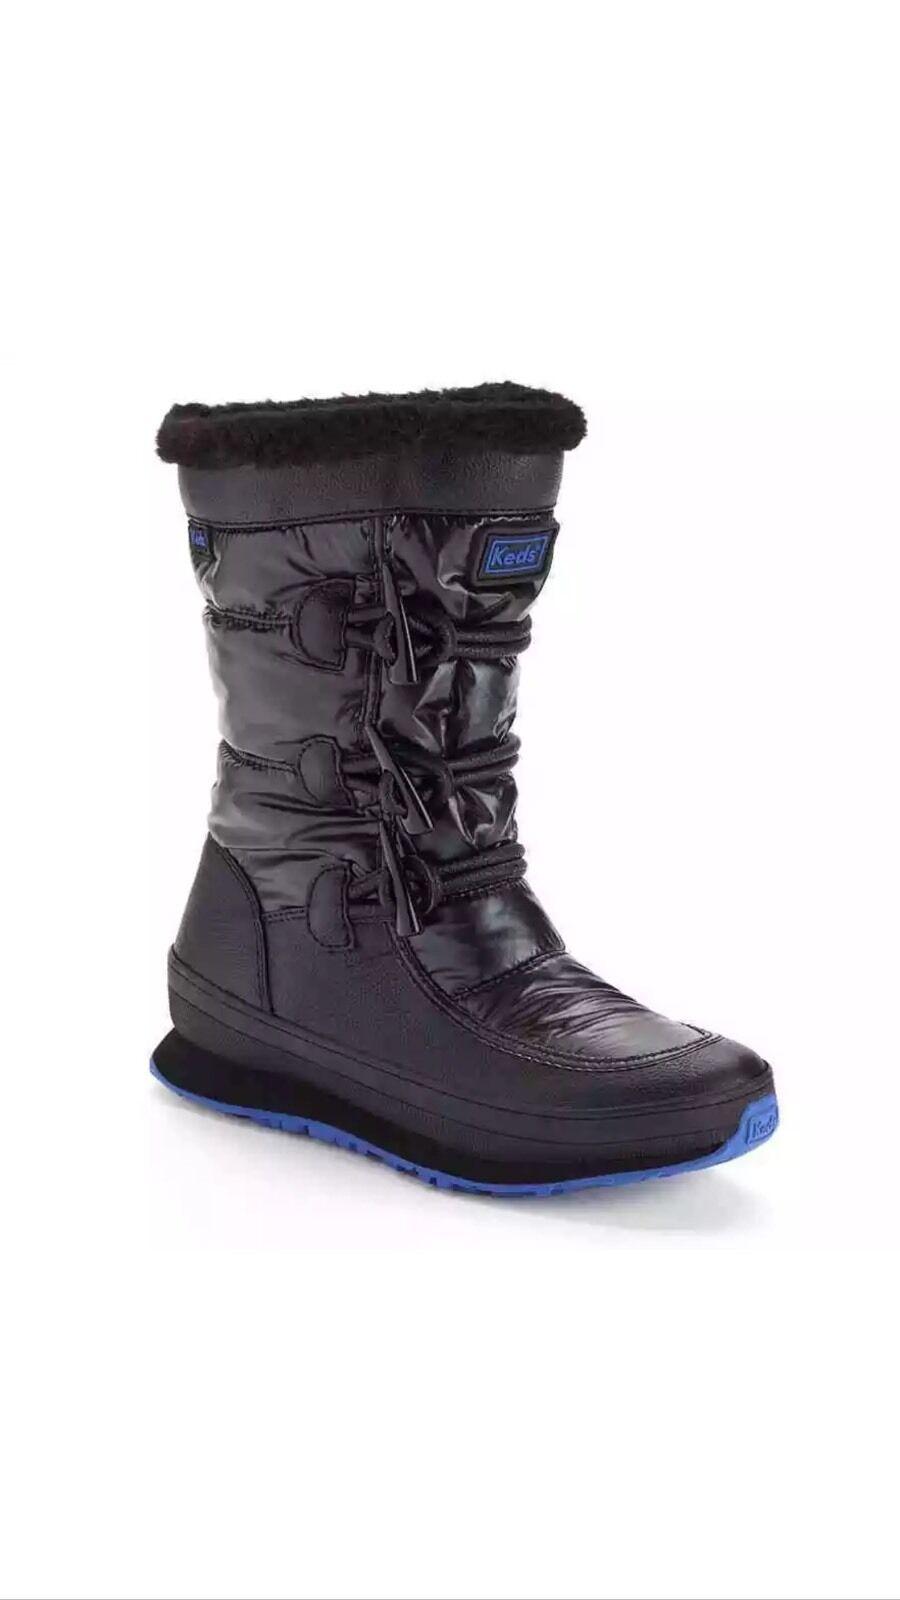 Keds Powder Puff Women's Boots Style WF52046 NWB Black Sz 6